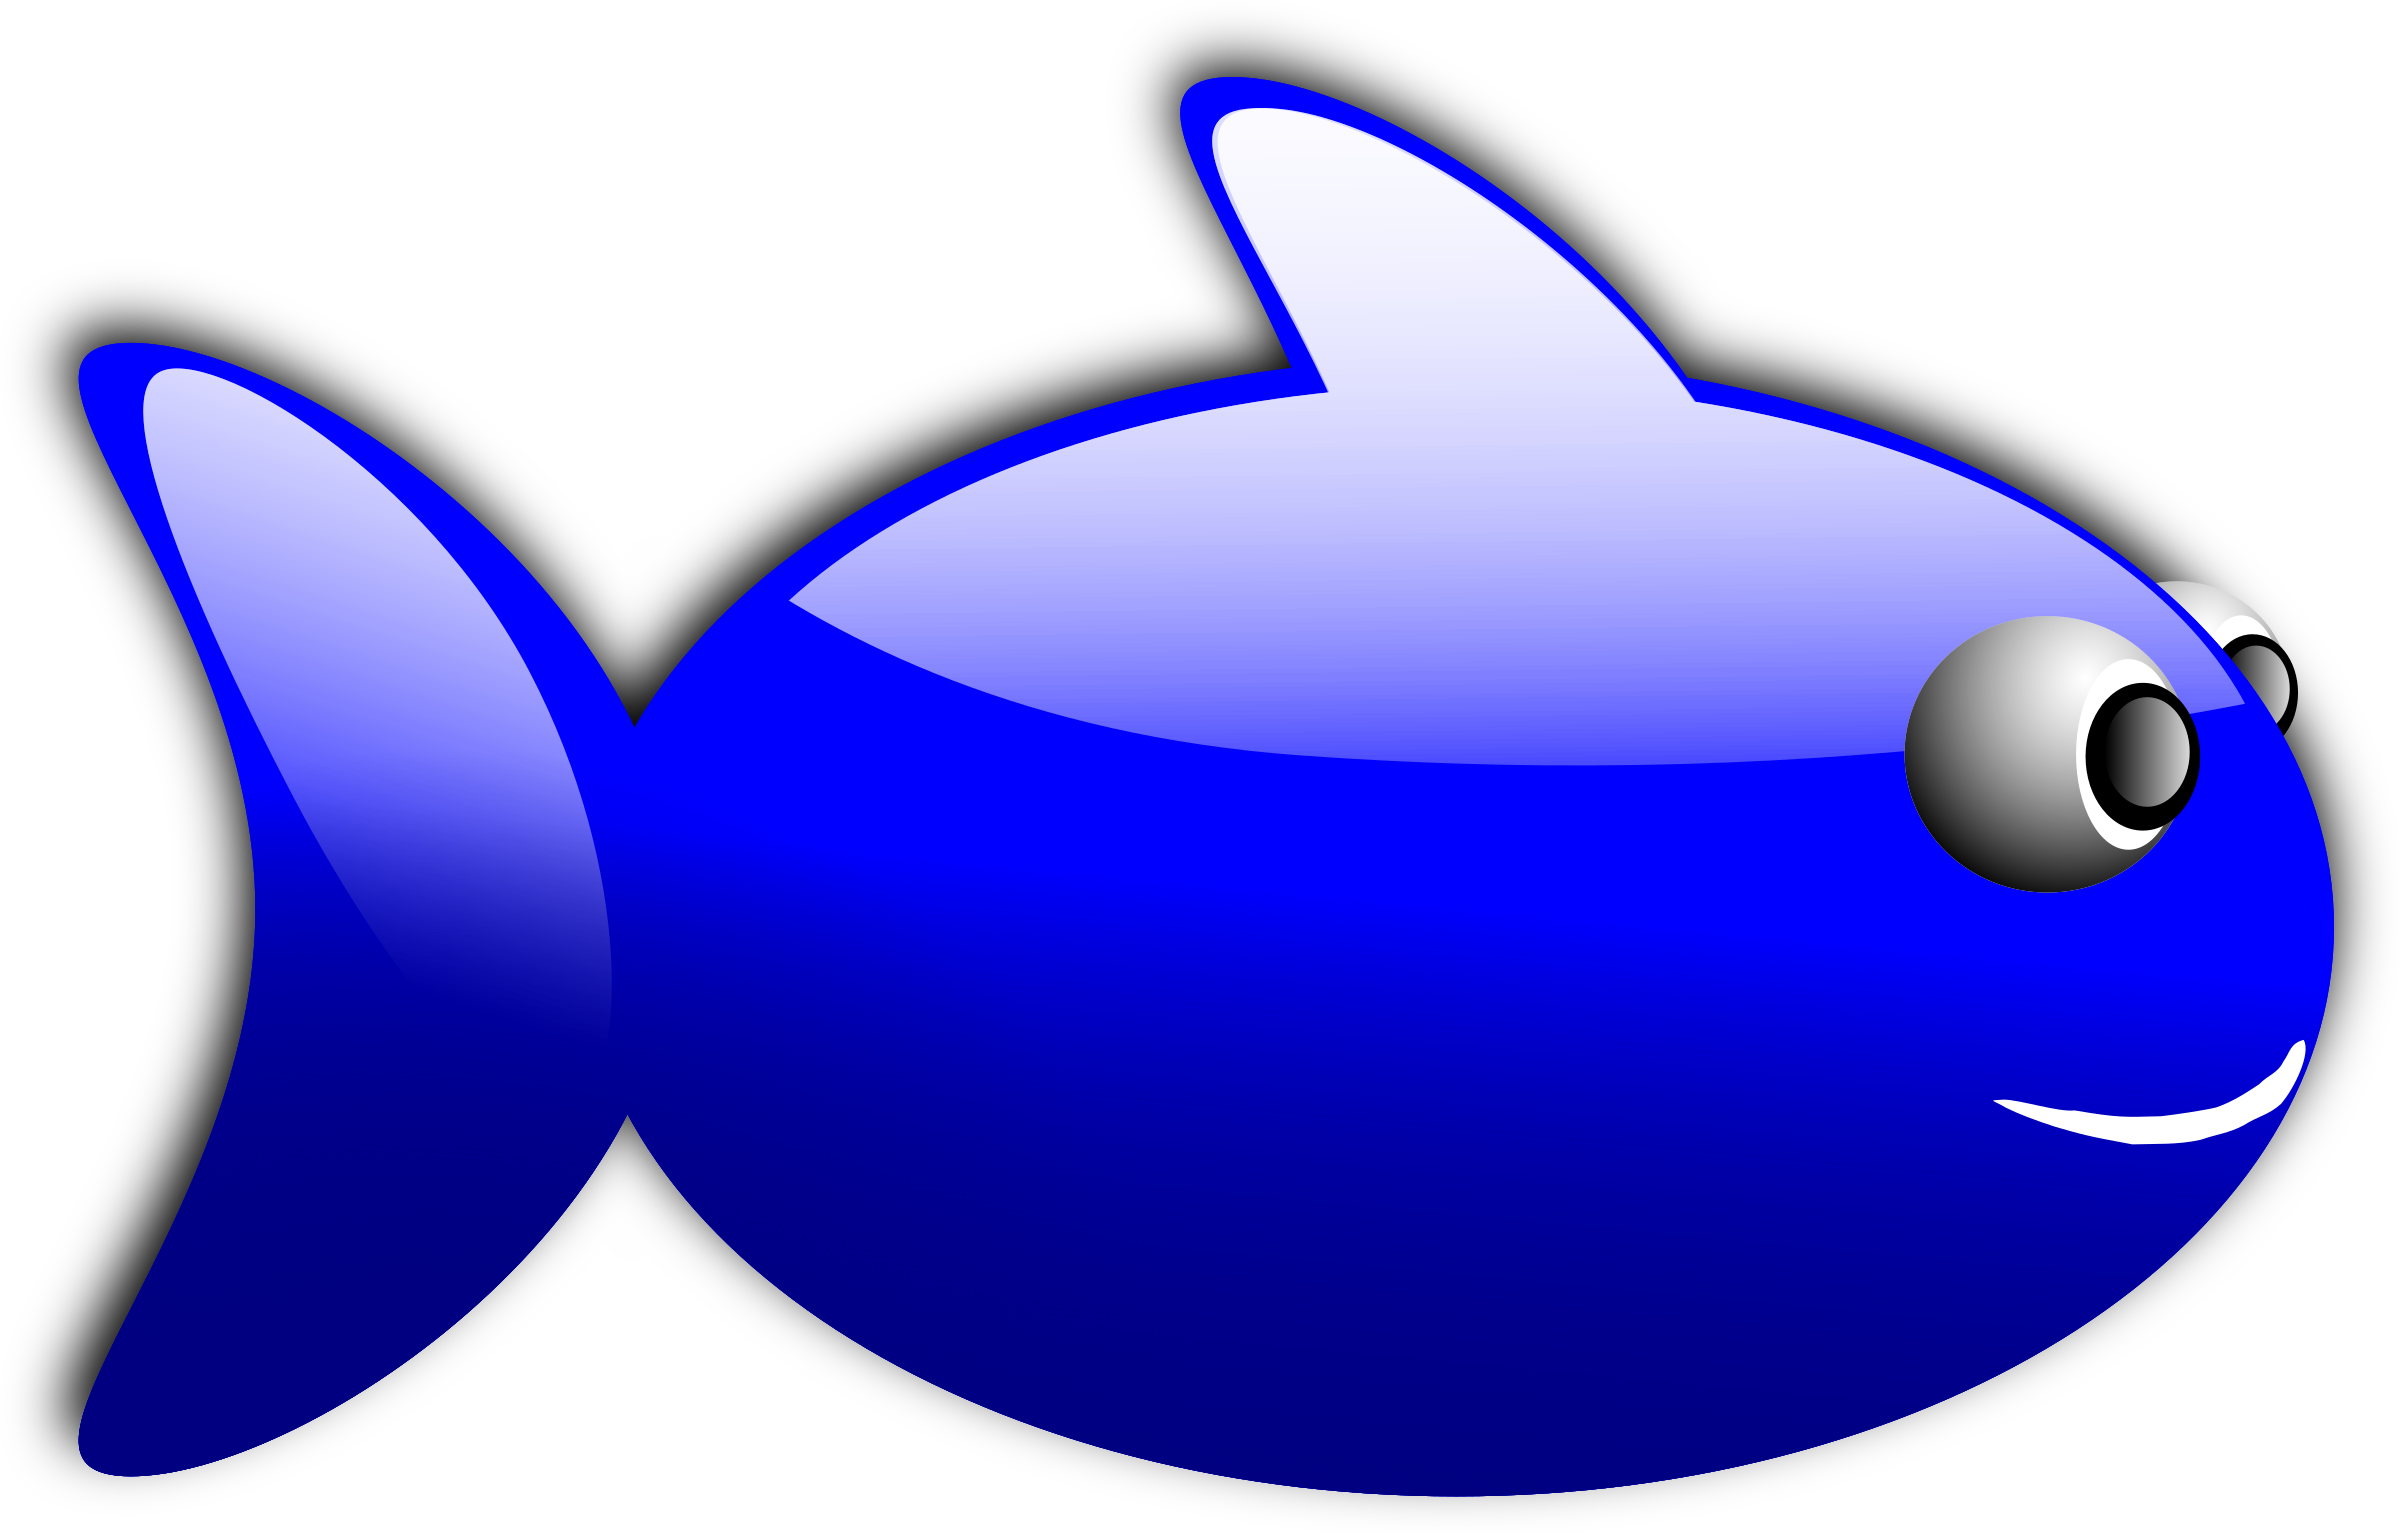 1 fish clipart clipart transparent download Clipart - Glossy fish 1 clipart transparent download